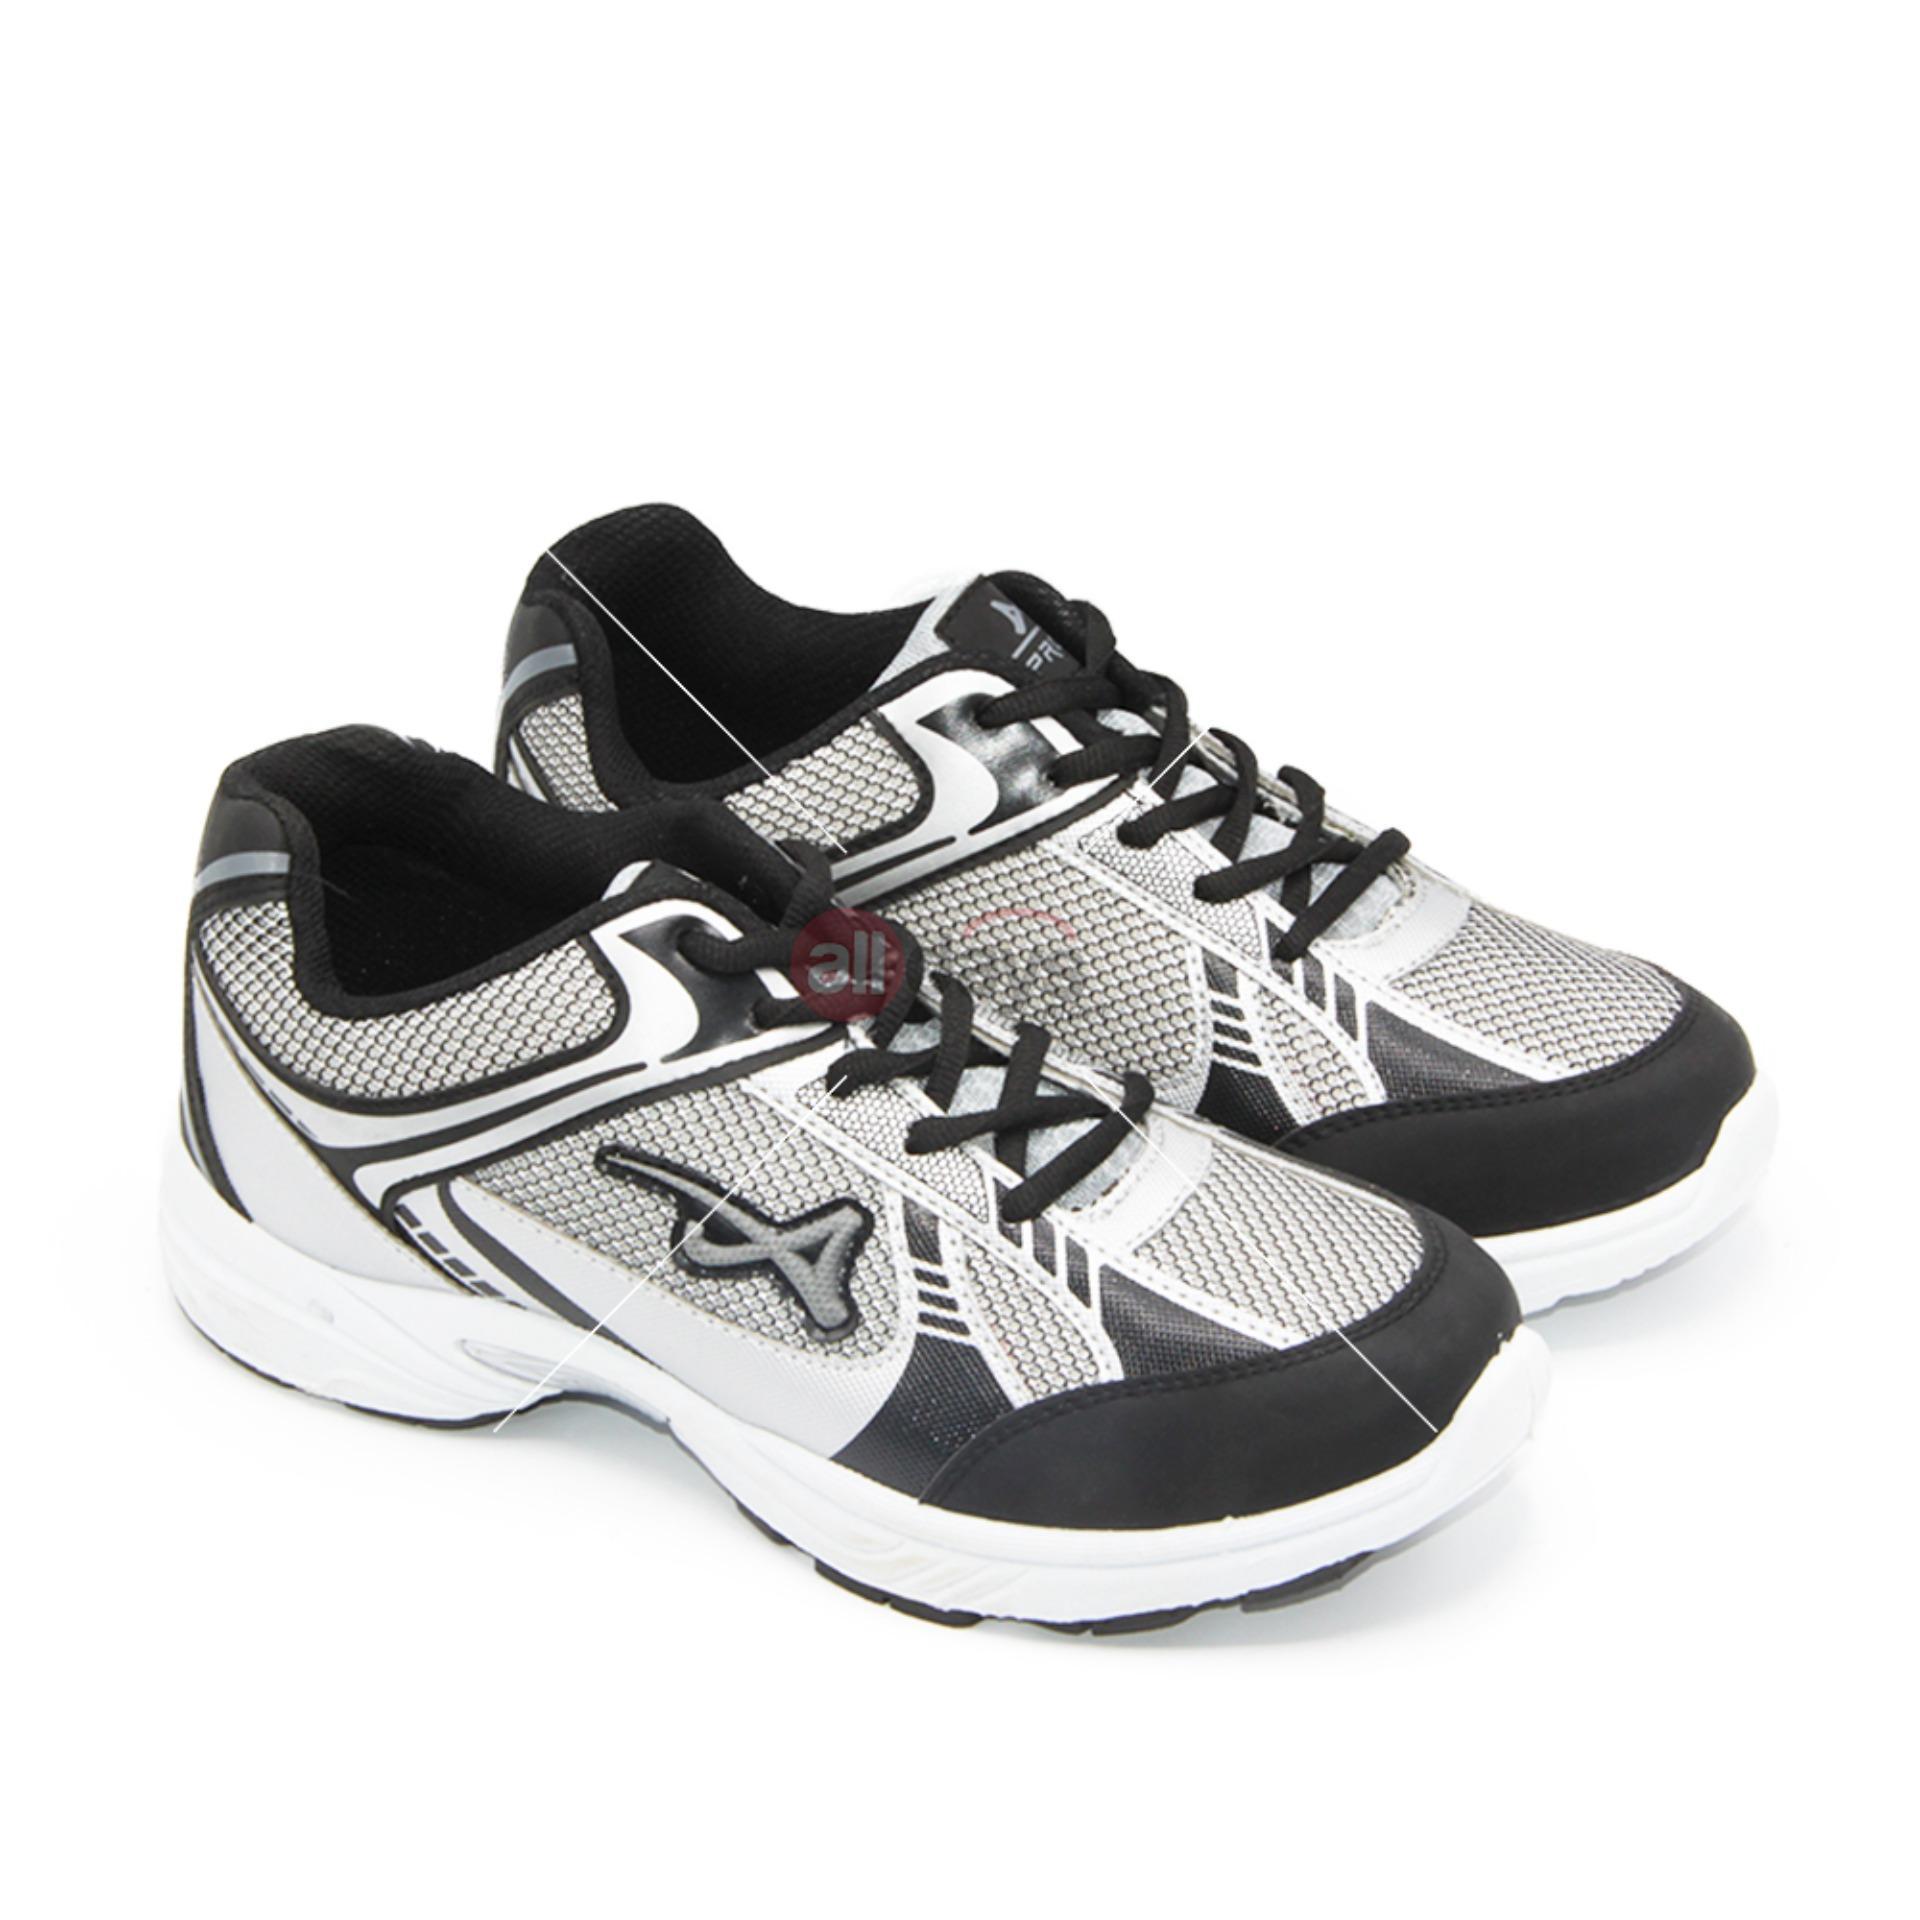 Beli Pro Att Sepatu Sport Sneakers Sepatu Lari Kasual Dan Sepatu Kets Mc 04 Abu Abu Hitam Putih Size 39 42 Nyicil